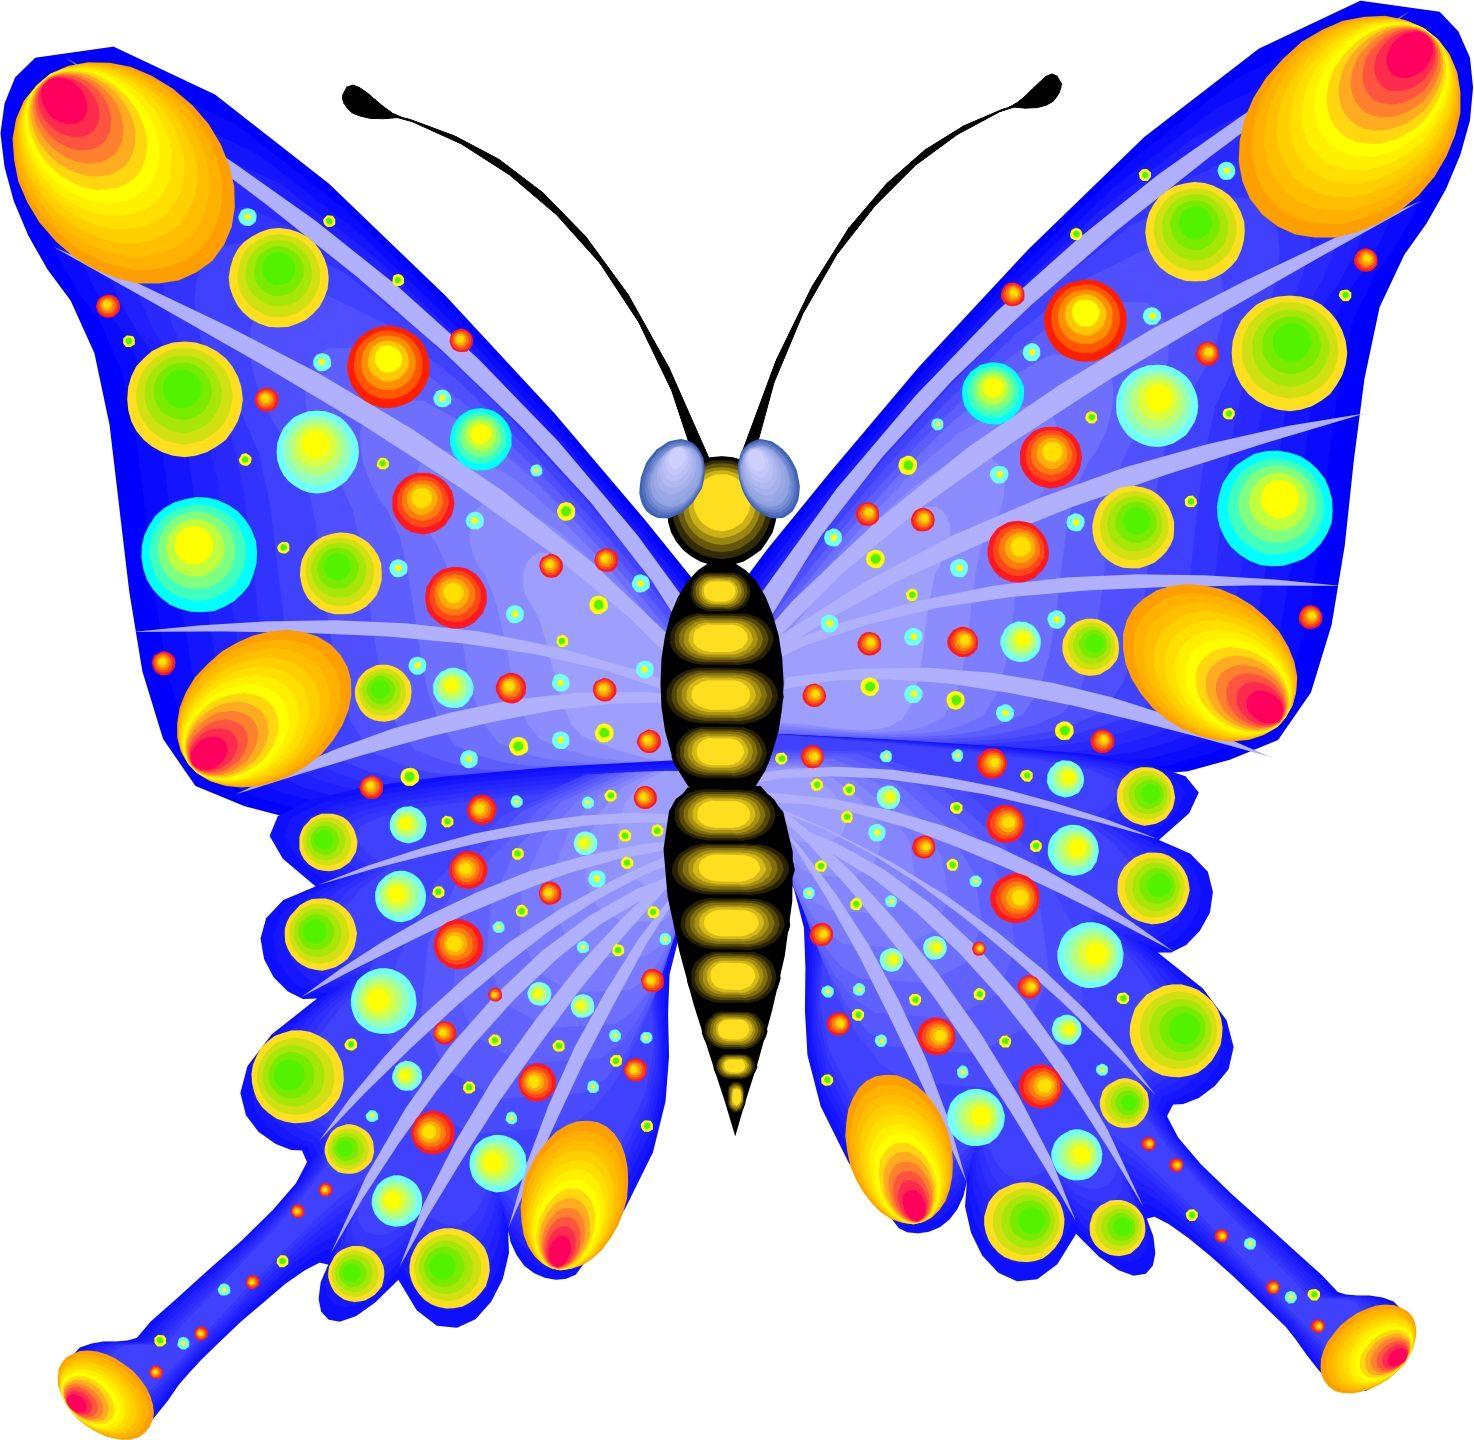 Cartoon Pictures Of Butterflies - ClipArt Best | Butterfly ...